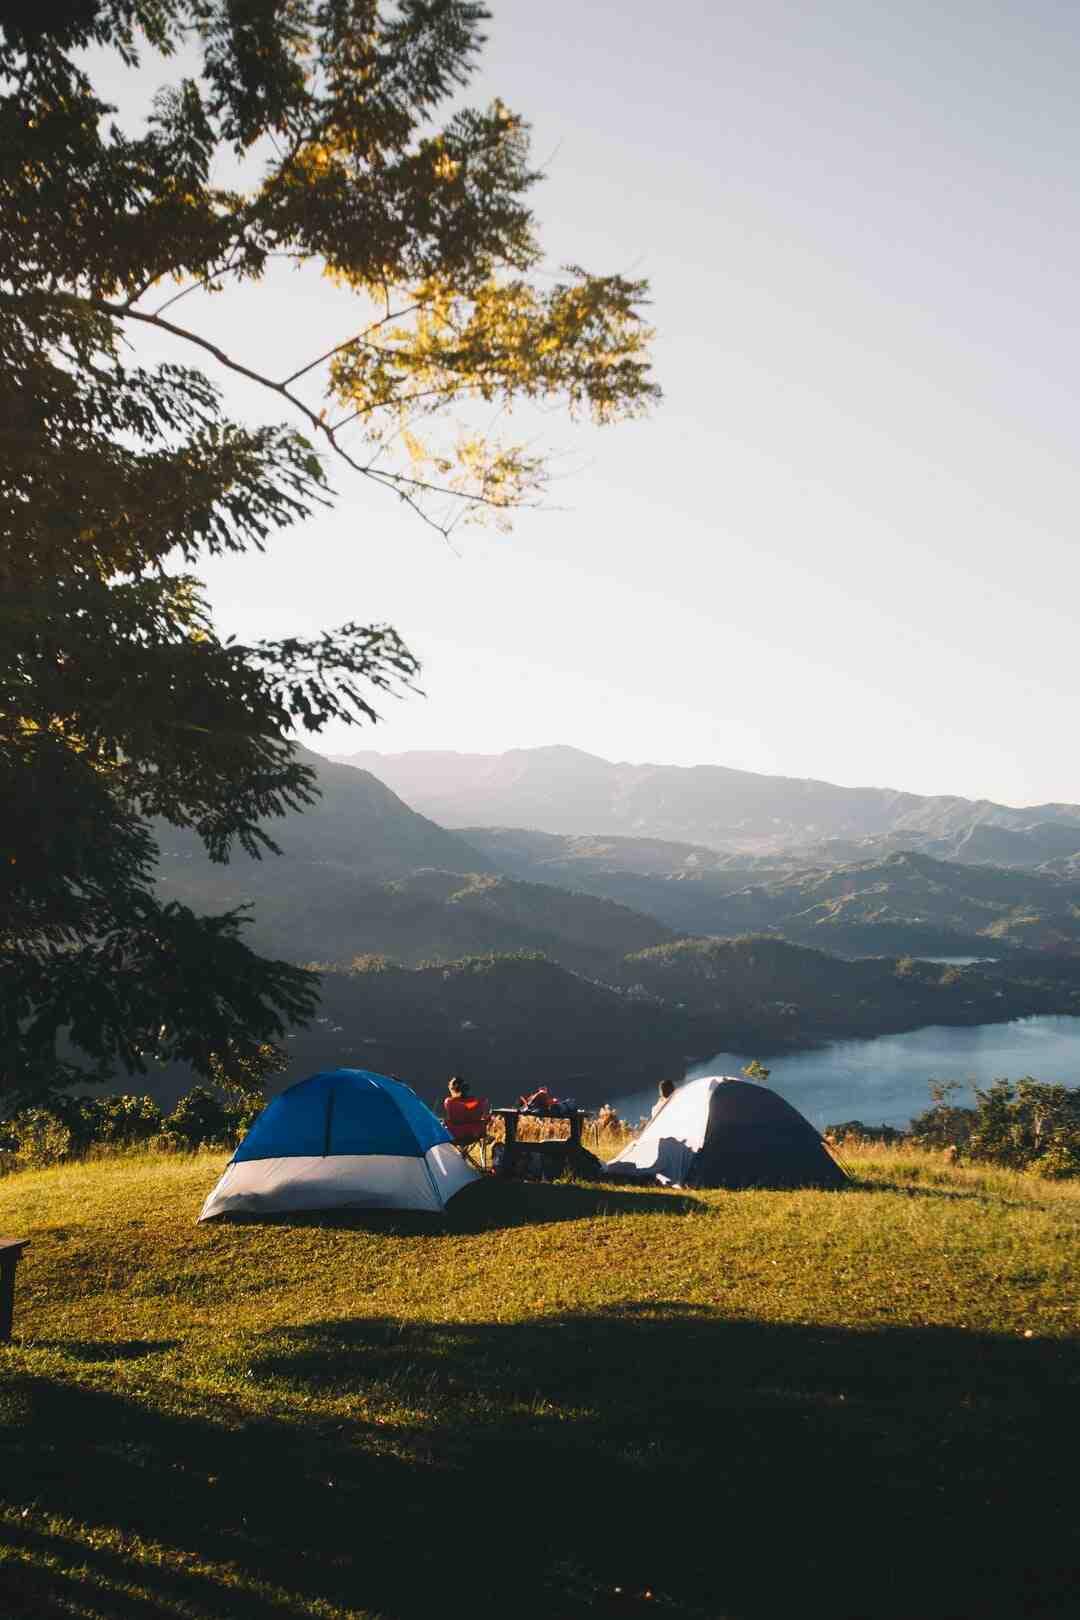 Quel est le prix d'un Camping-car d'occasion ?